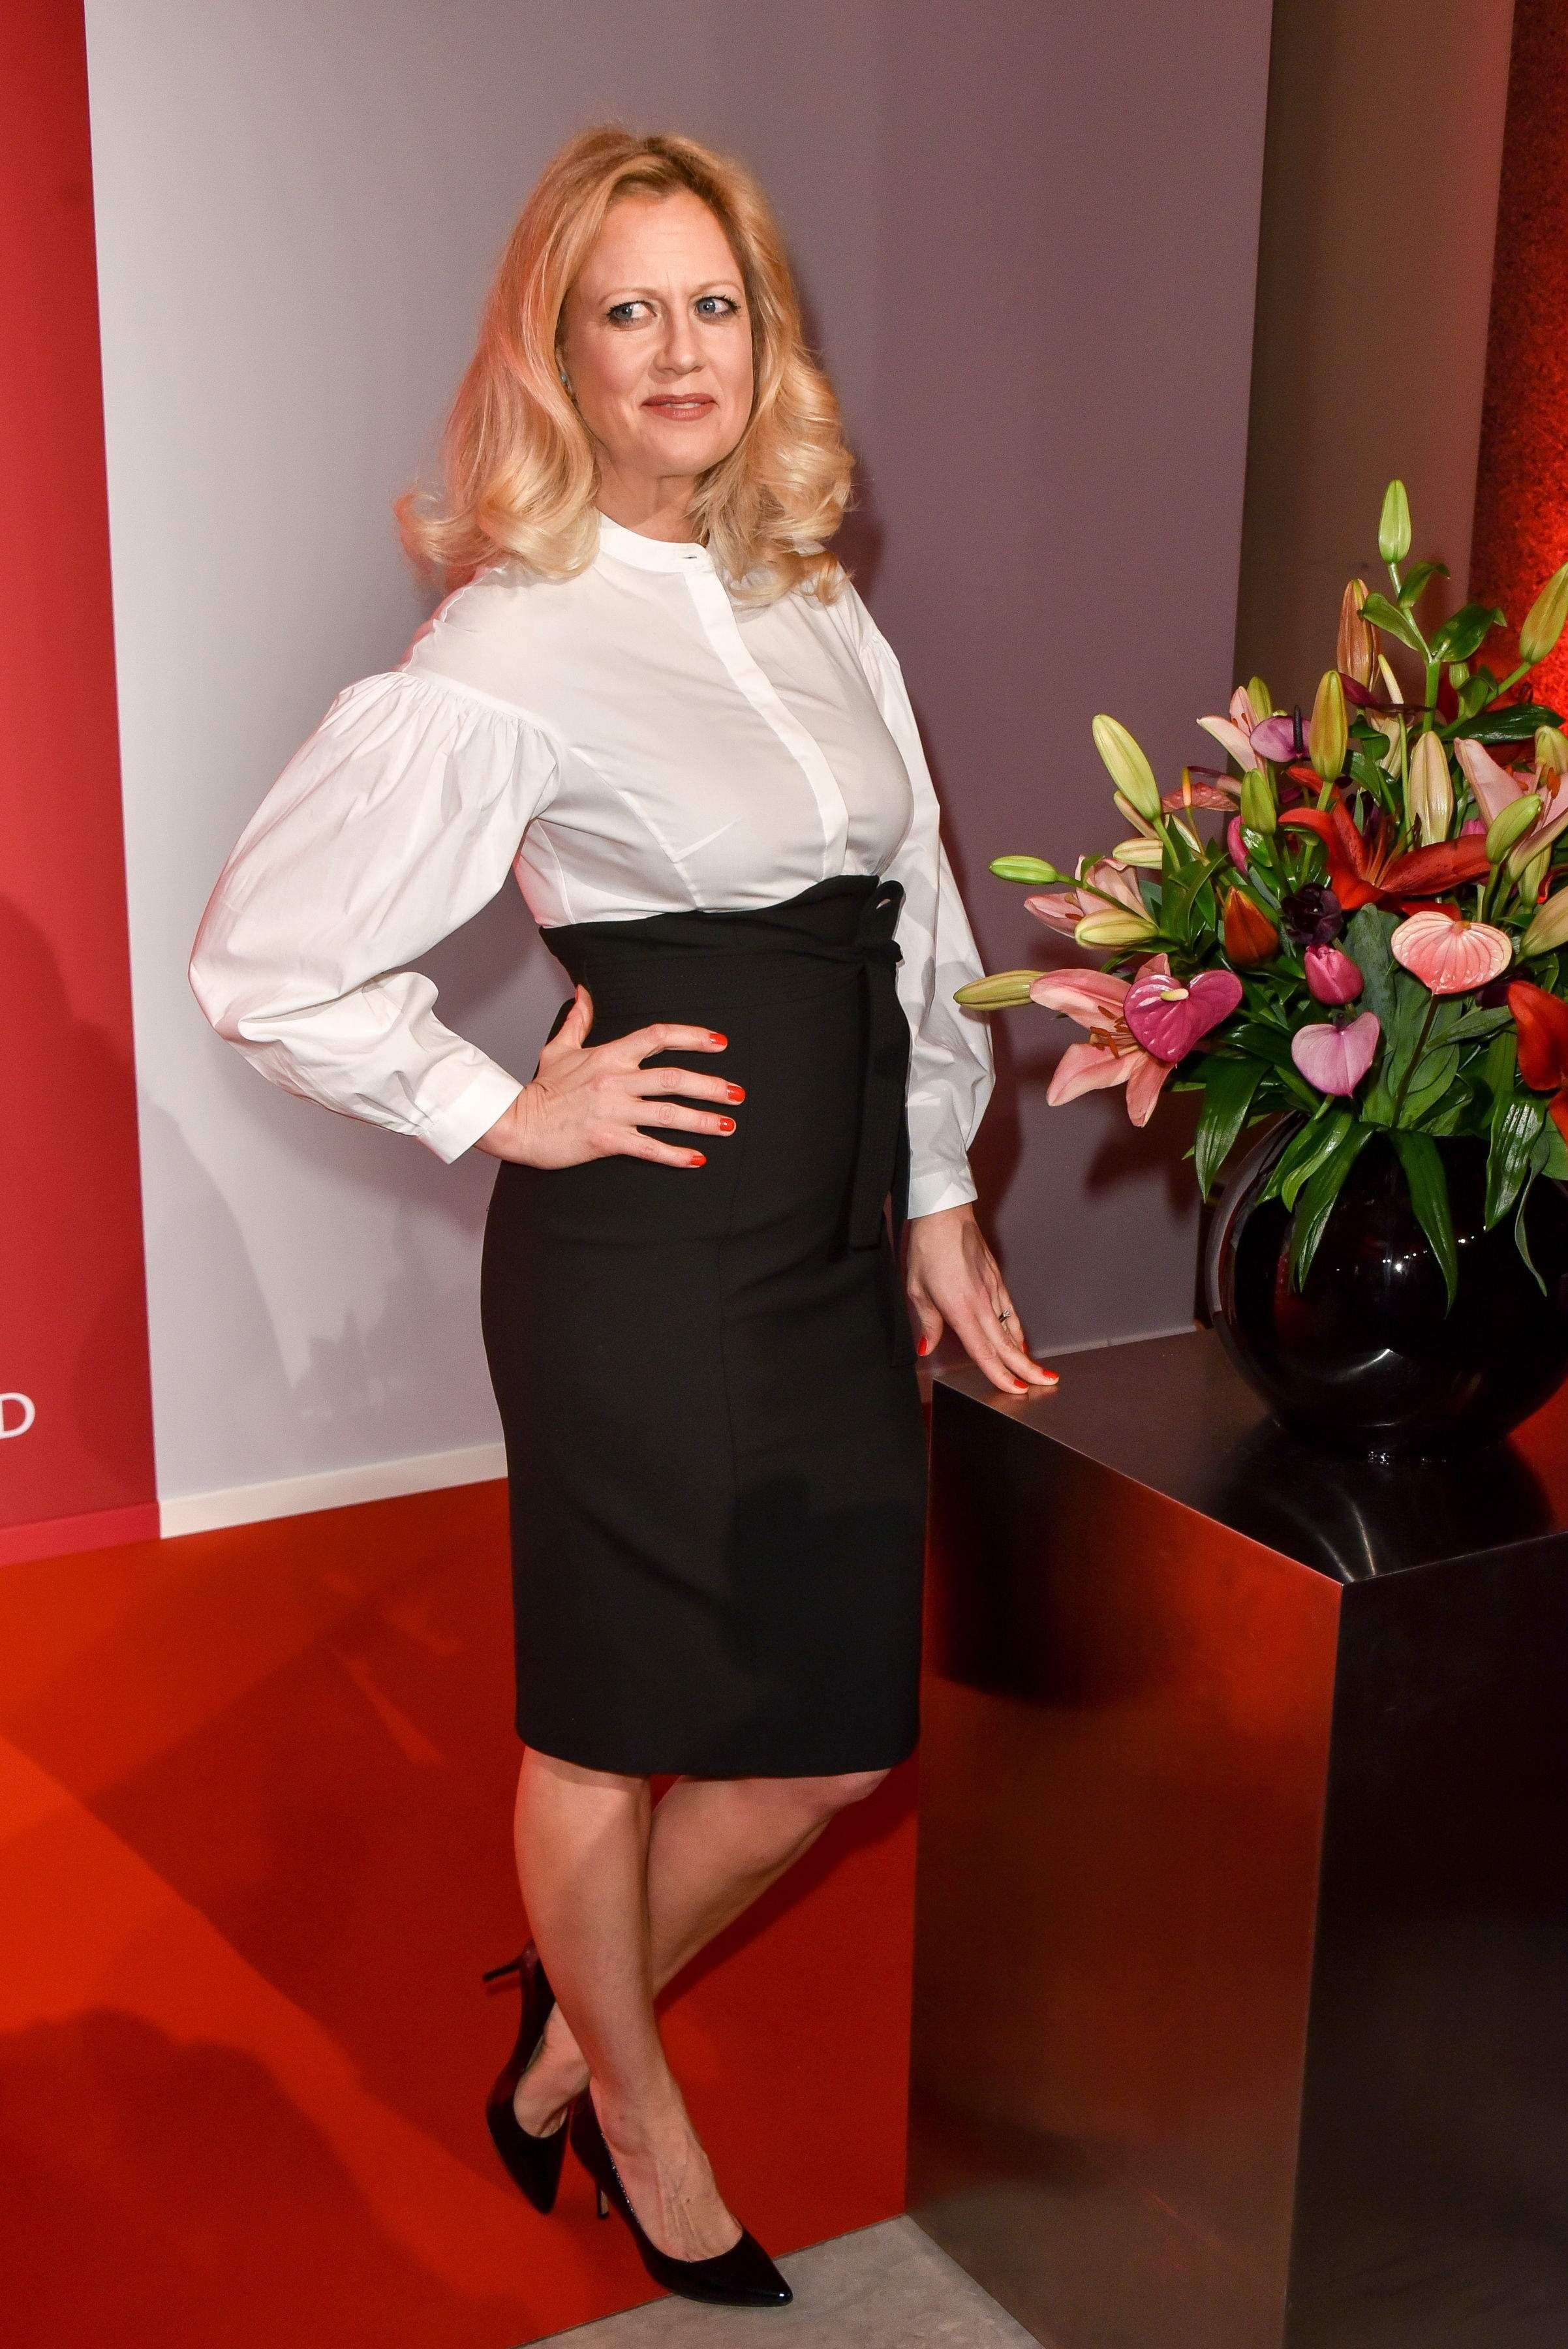 Barbara Schöneberger Reemtsma Liberty Award In Berlin 220318